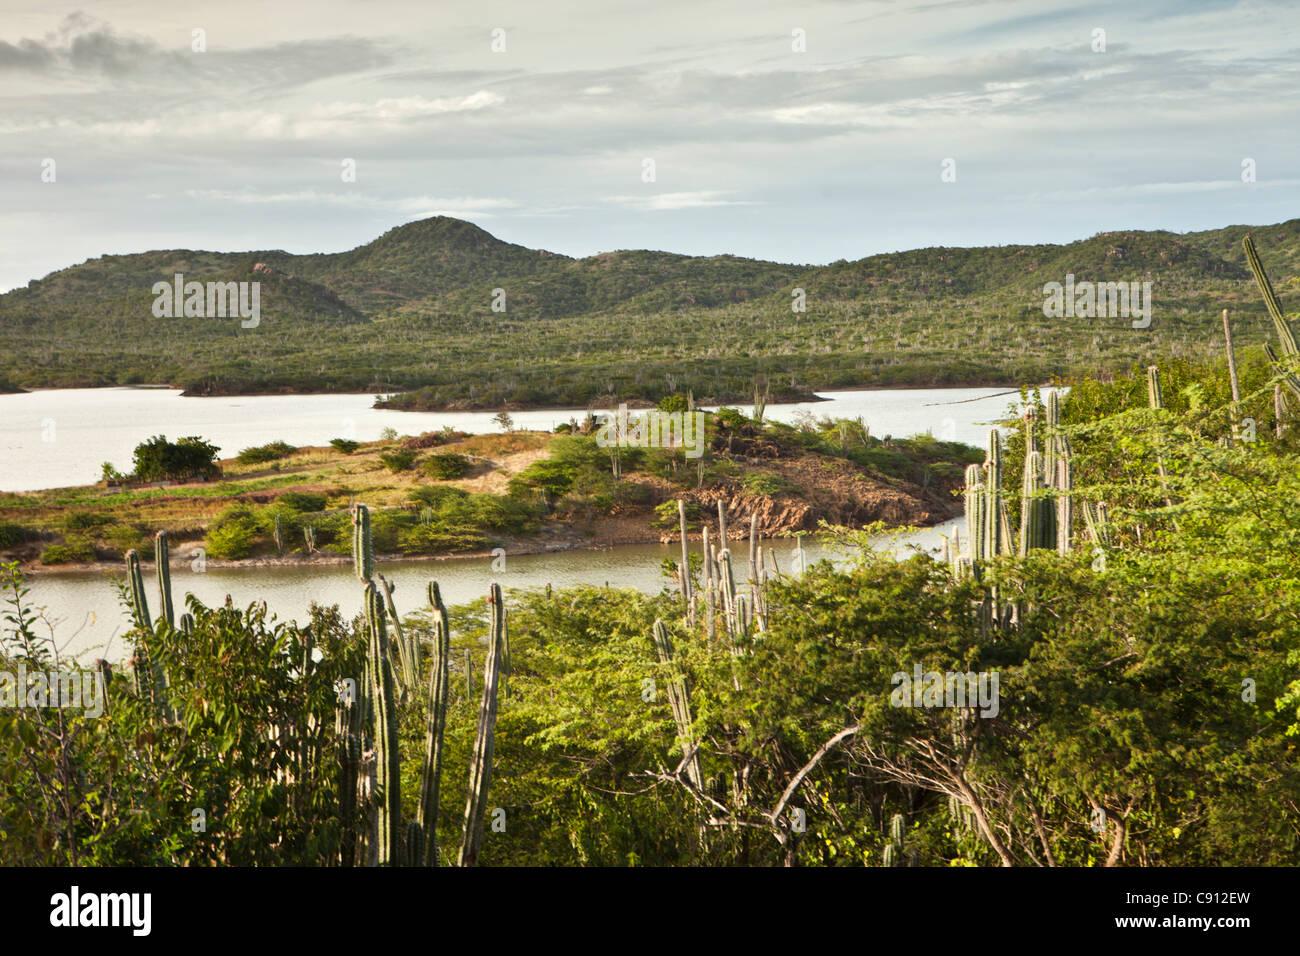 The Netherlands, Bonaire Island, Dutch Caribbean, Washington Slagbaai National Park, - Stock Image